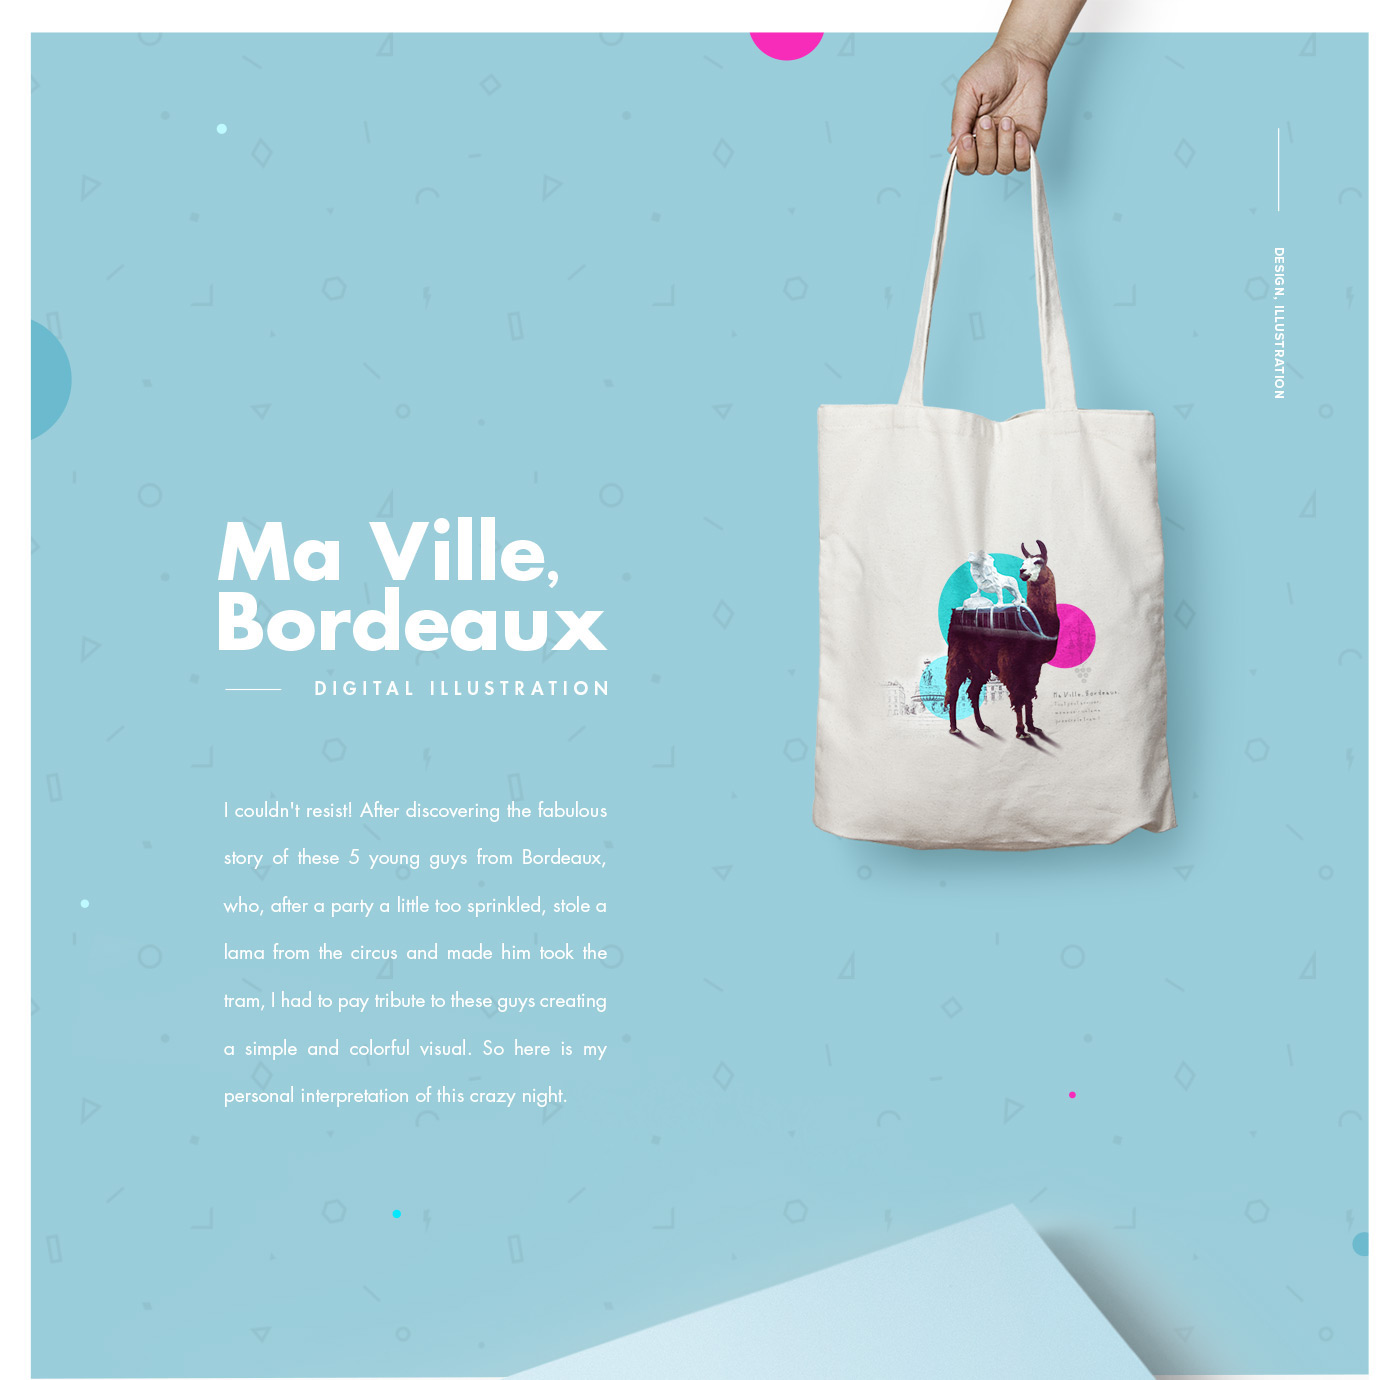 Bordeaux tshirt Serge Le Lama graphic LAMA design digital illustration colorful pillow print